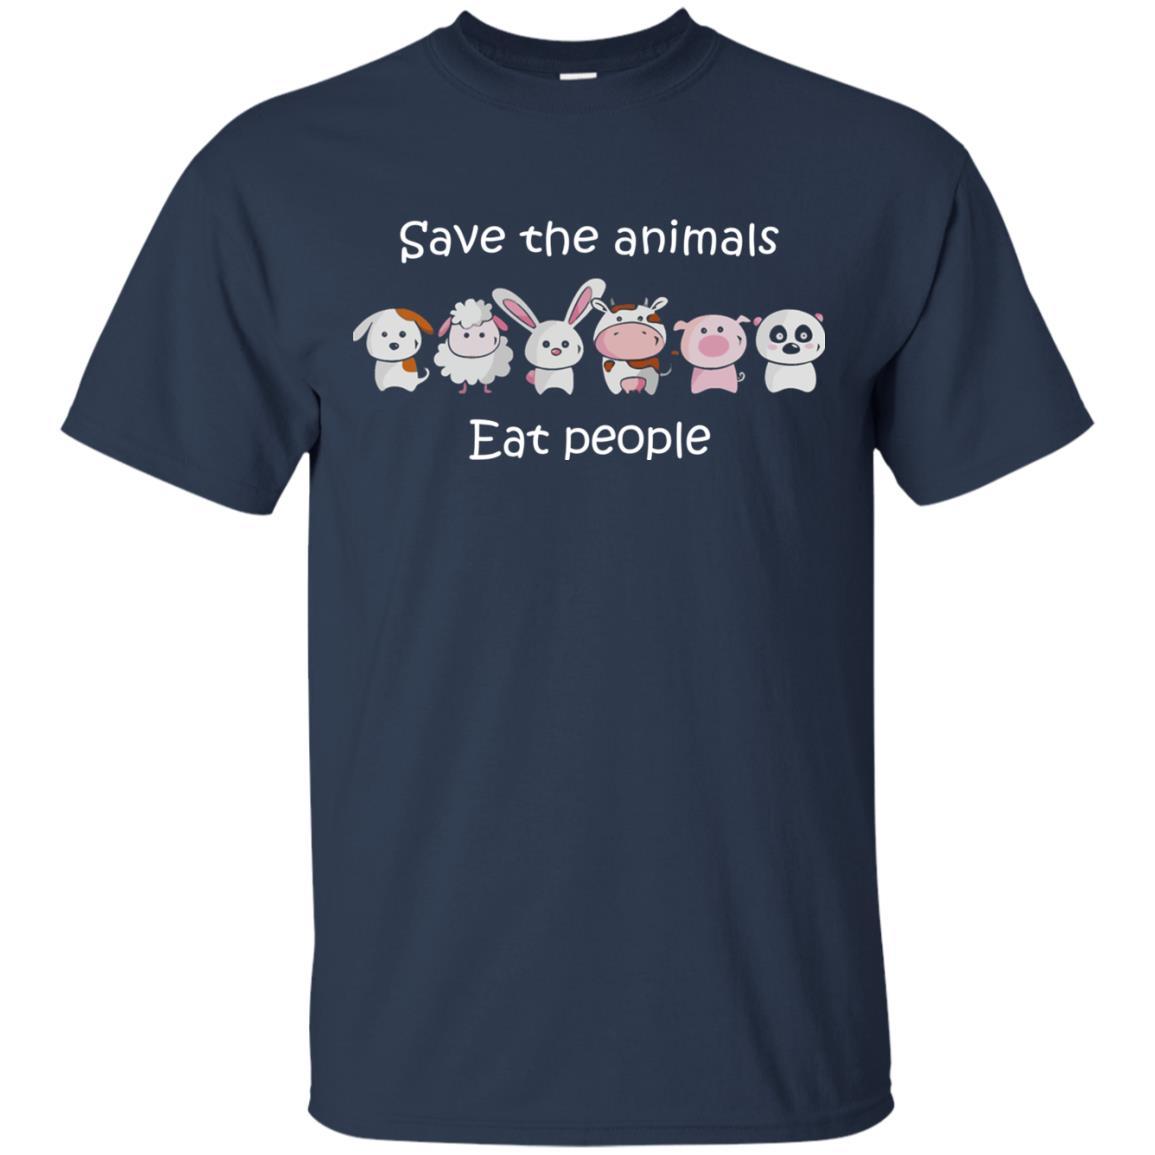 image 1511px Funny vegan shirt: save the animals eat people t shirt, hoodies, tank top